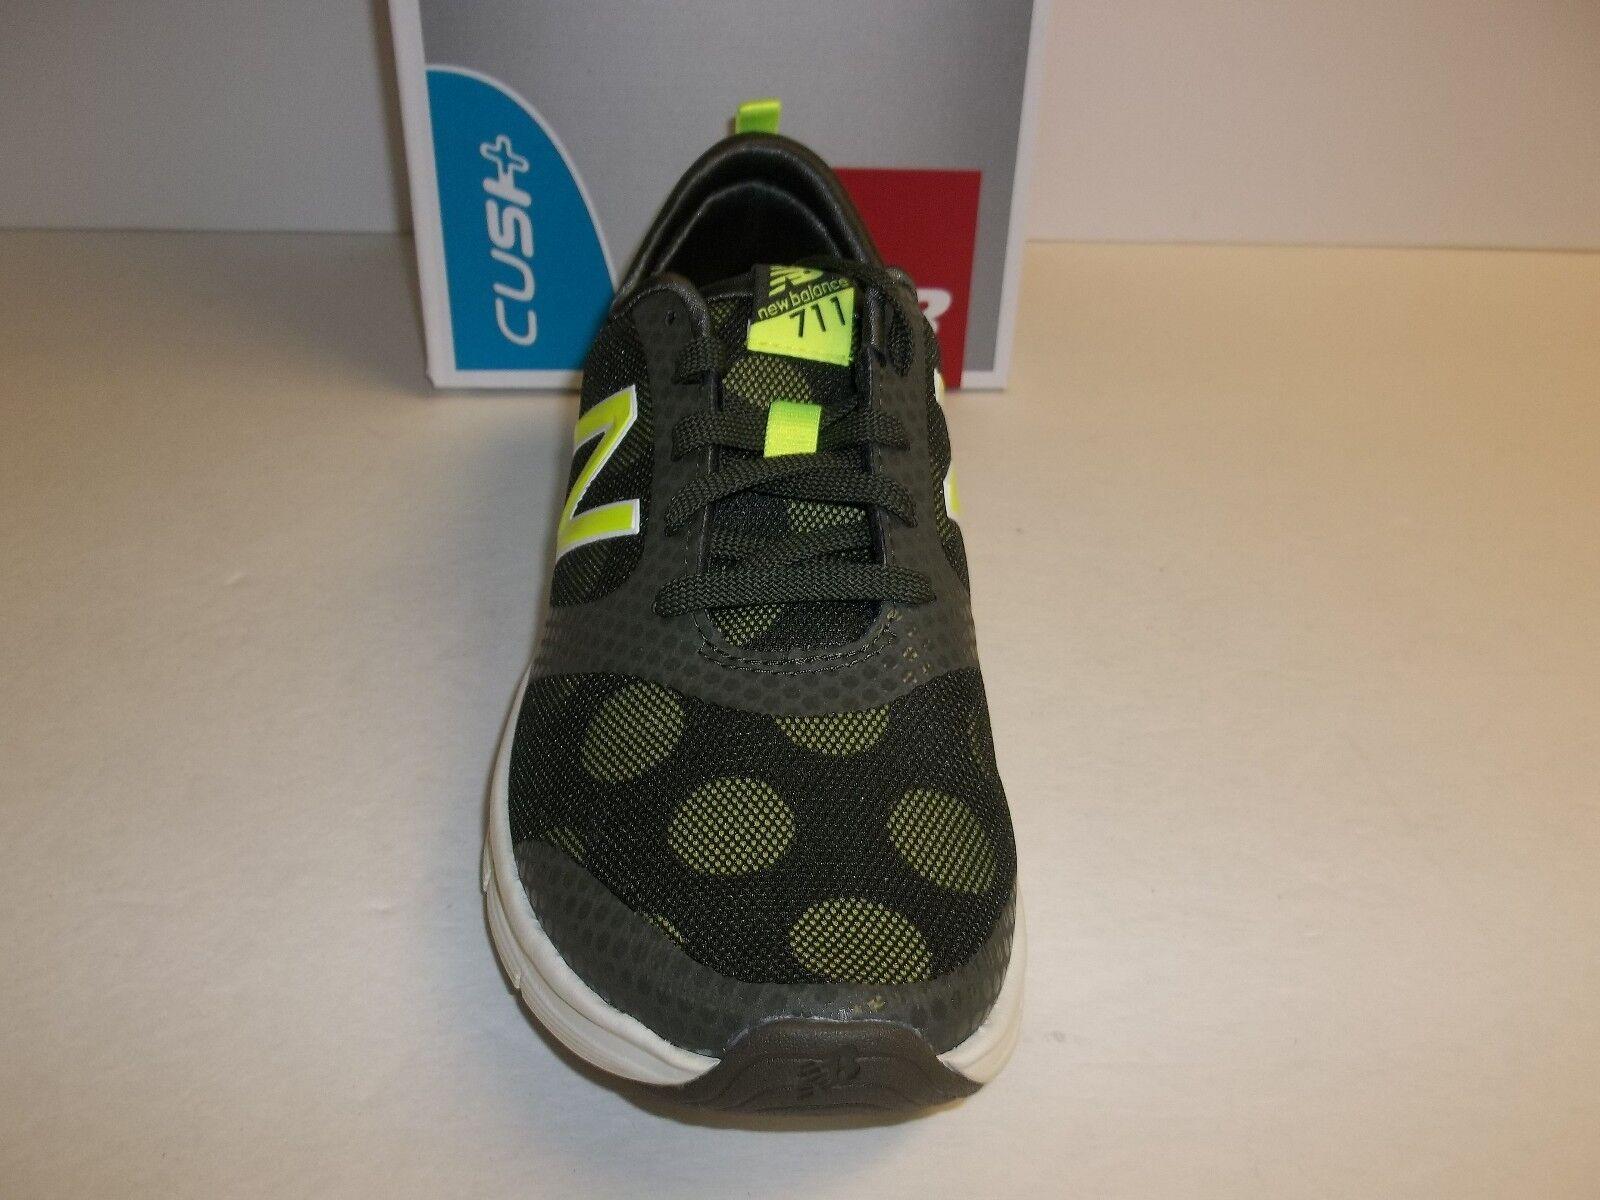 New New New Balance Dimensione 7 M 711 WX711HD verde Training scarpe da ginnastica New donna scarpe NWOB c7d3ca